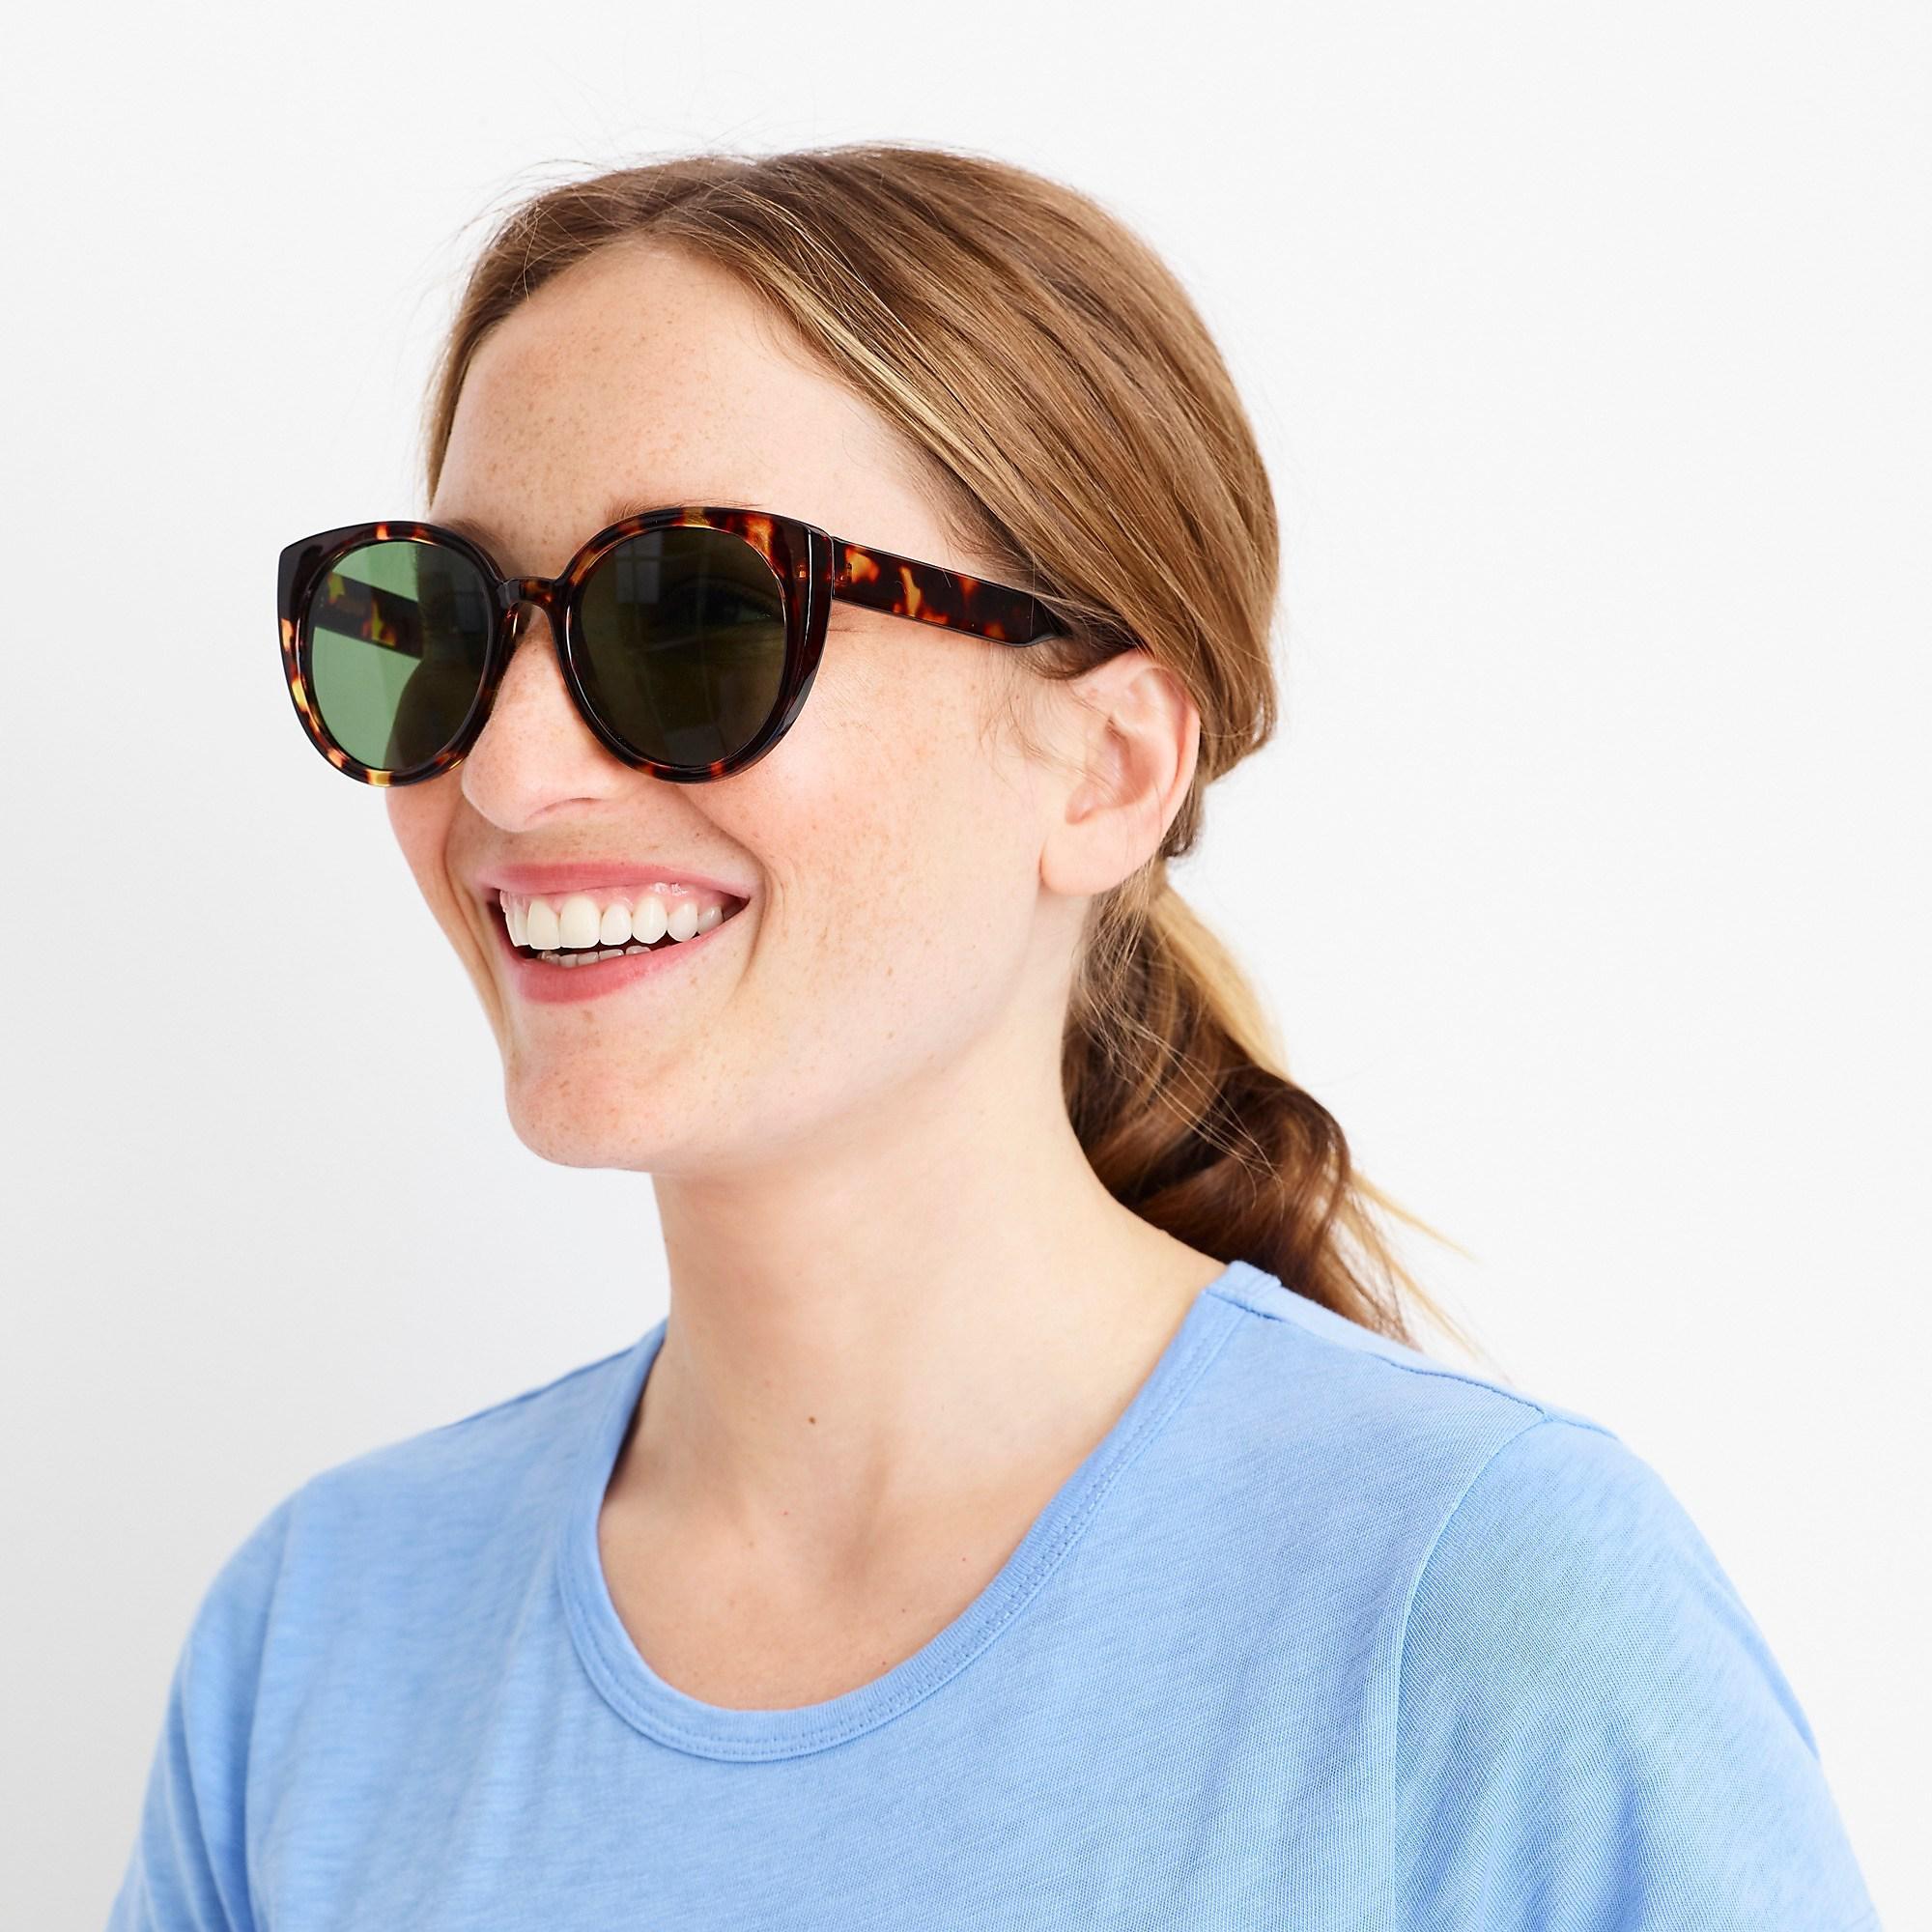 89e5141513 J.Crew Oversized Sunglasses in Green - Lyst